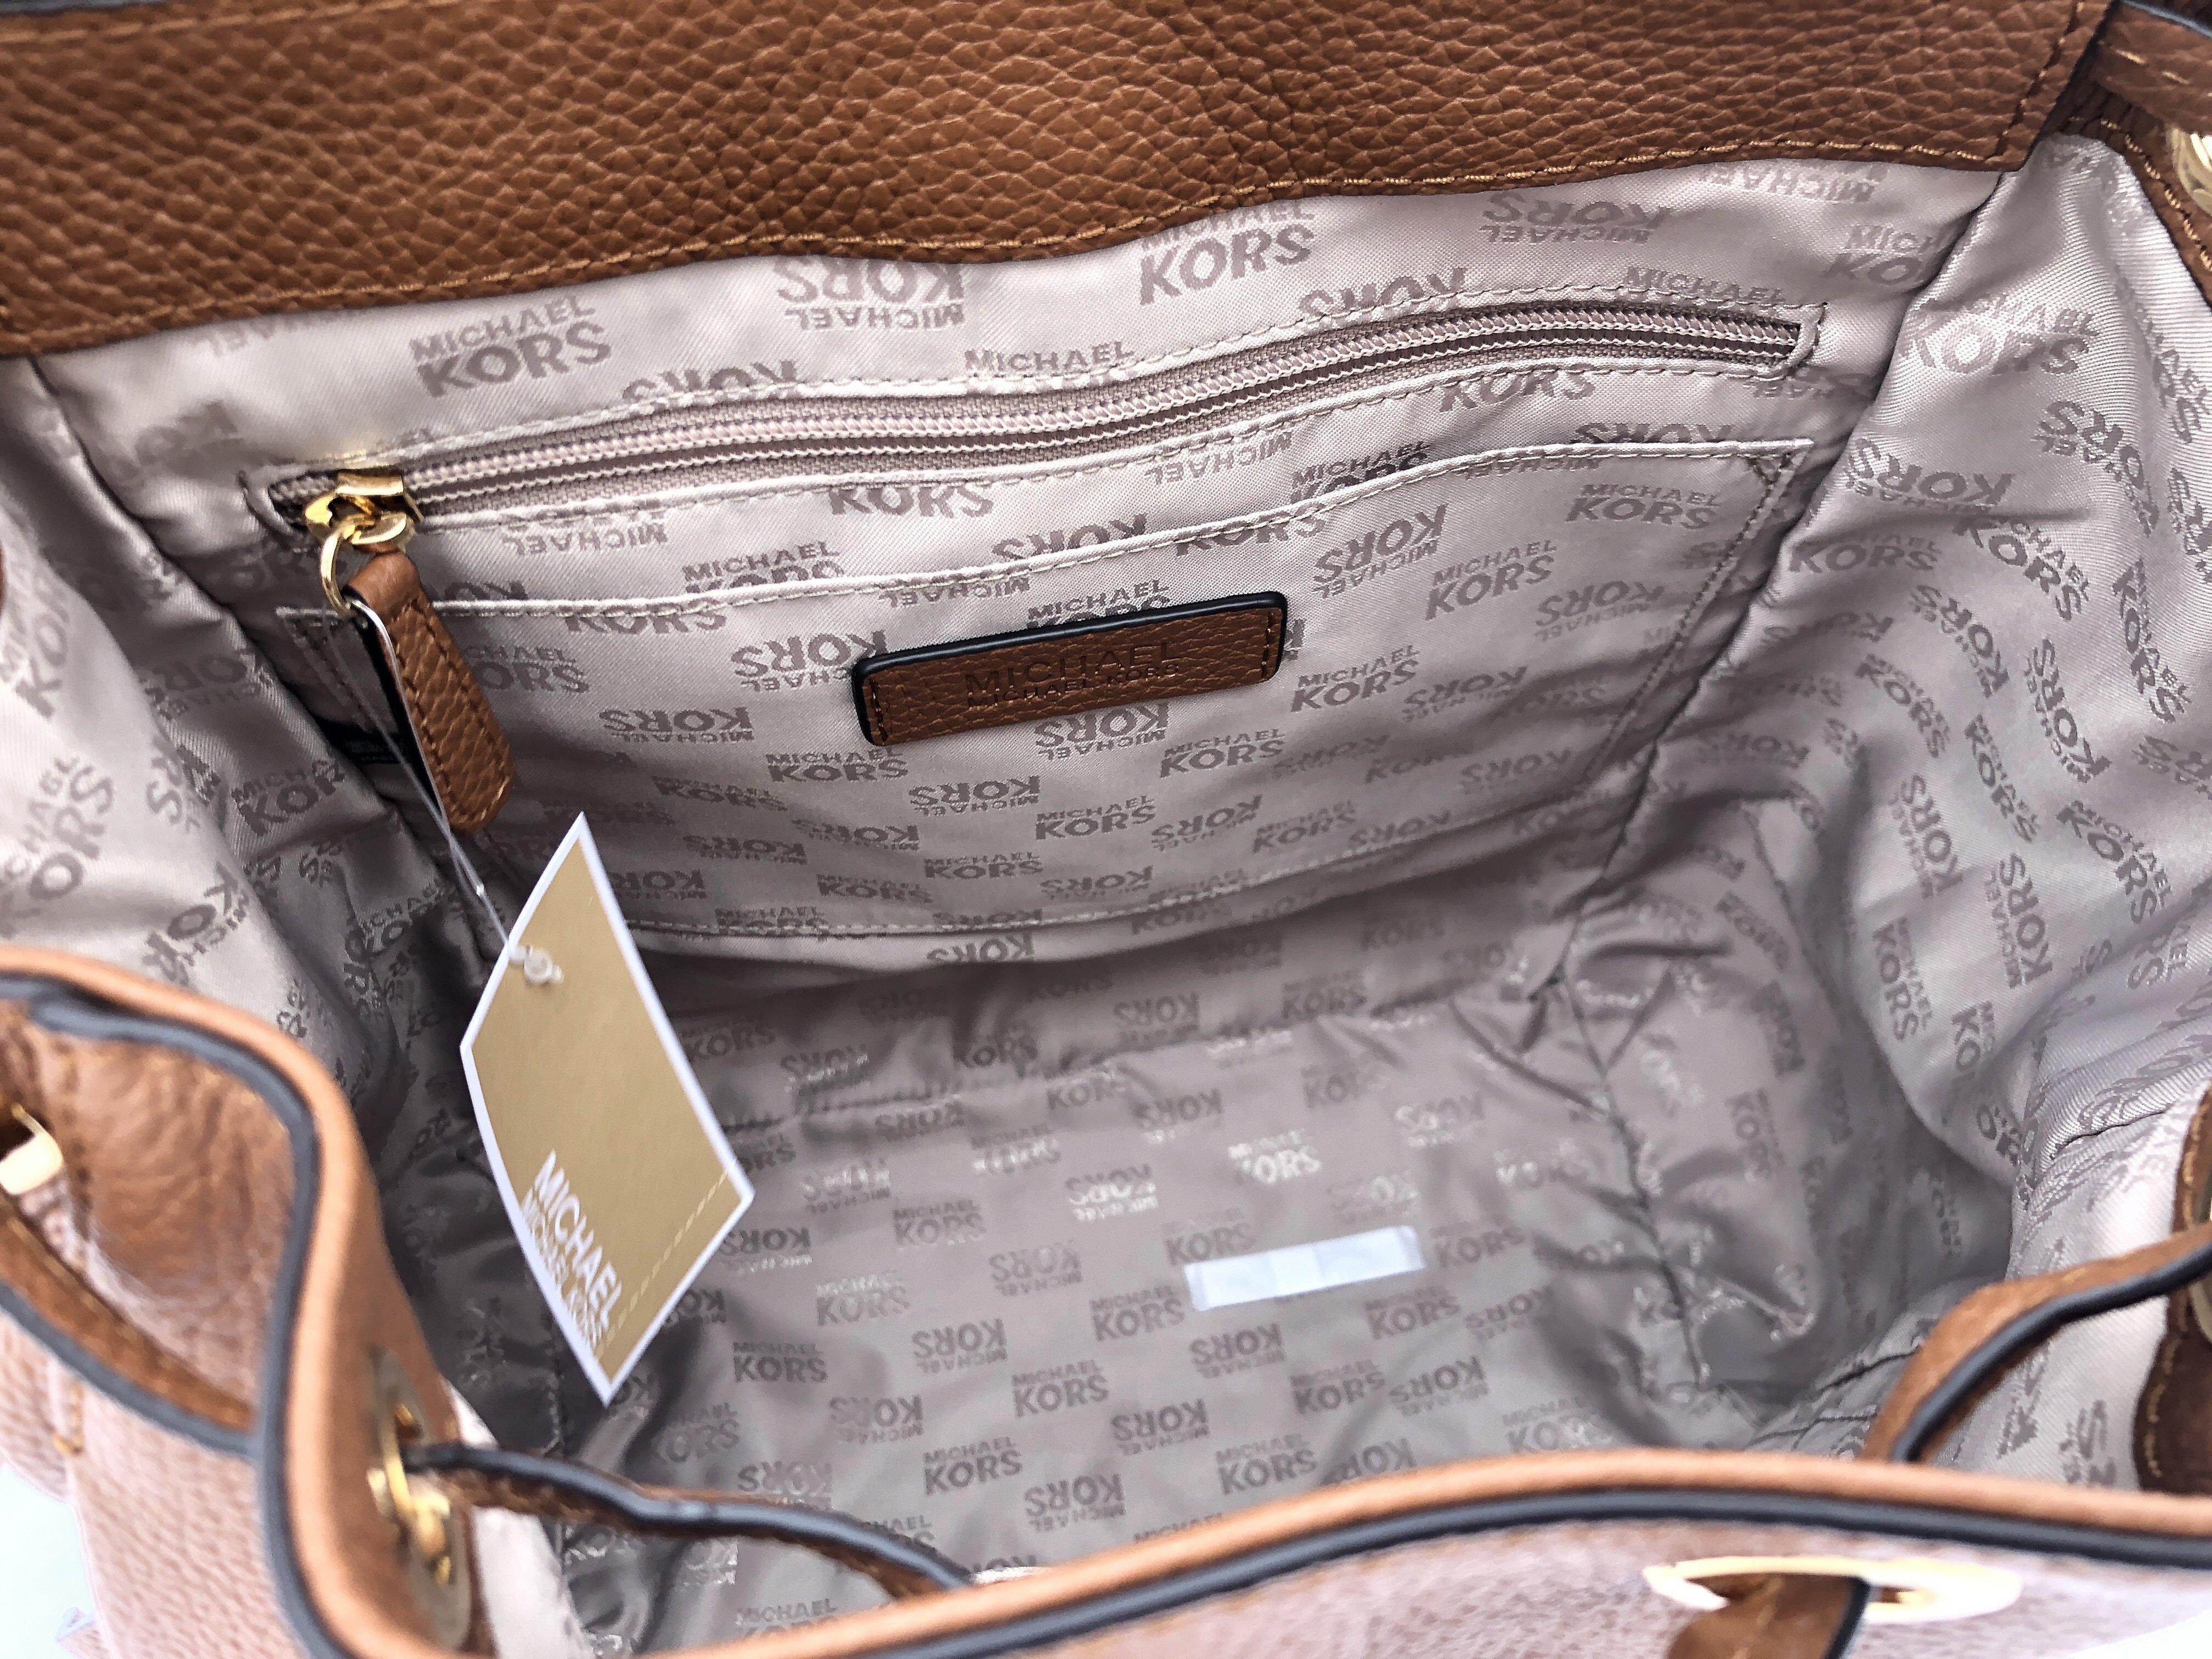 Michael Kors - Michael Kors Riley Large Leather Backpack Luggage Brown  Drawstring Flap Bag - Walmart.com f51ea200d4f8c